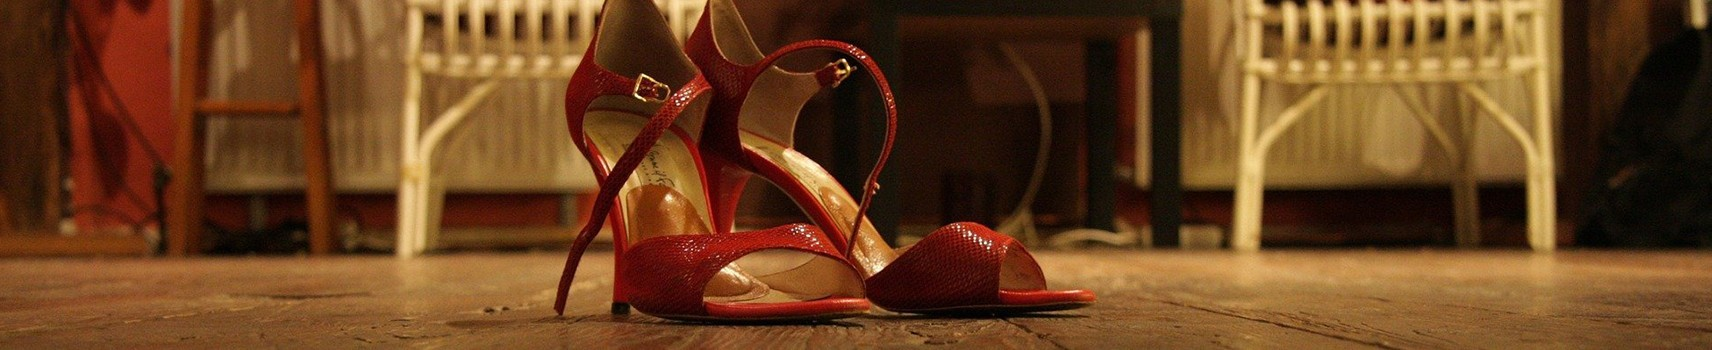 Women's Designer Shoes | Shop Luxury Designers Online at AGEMINA